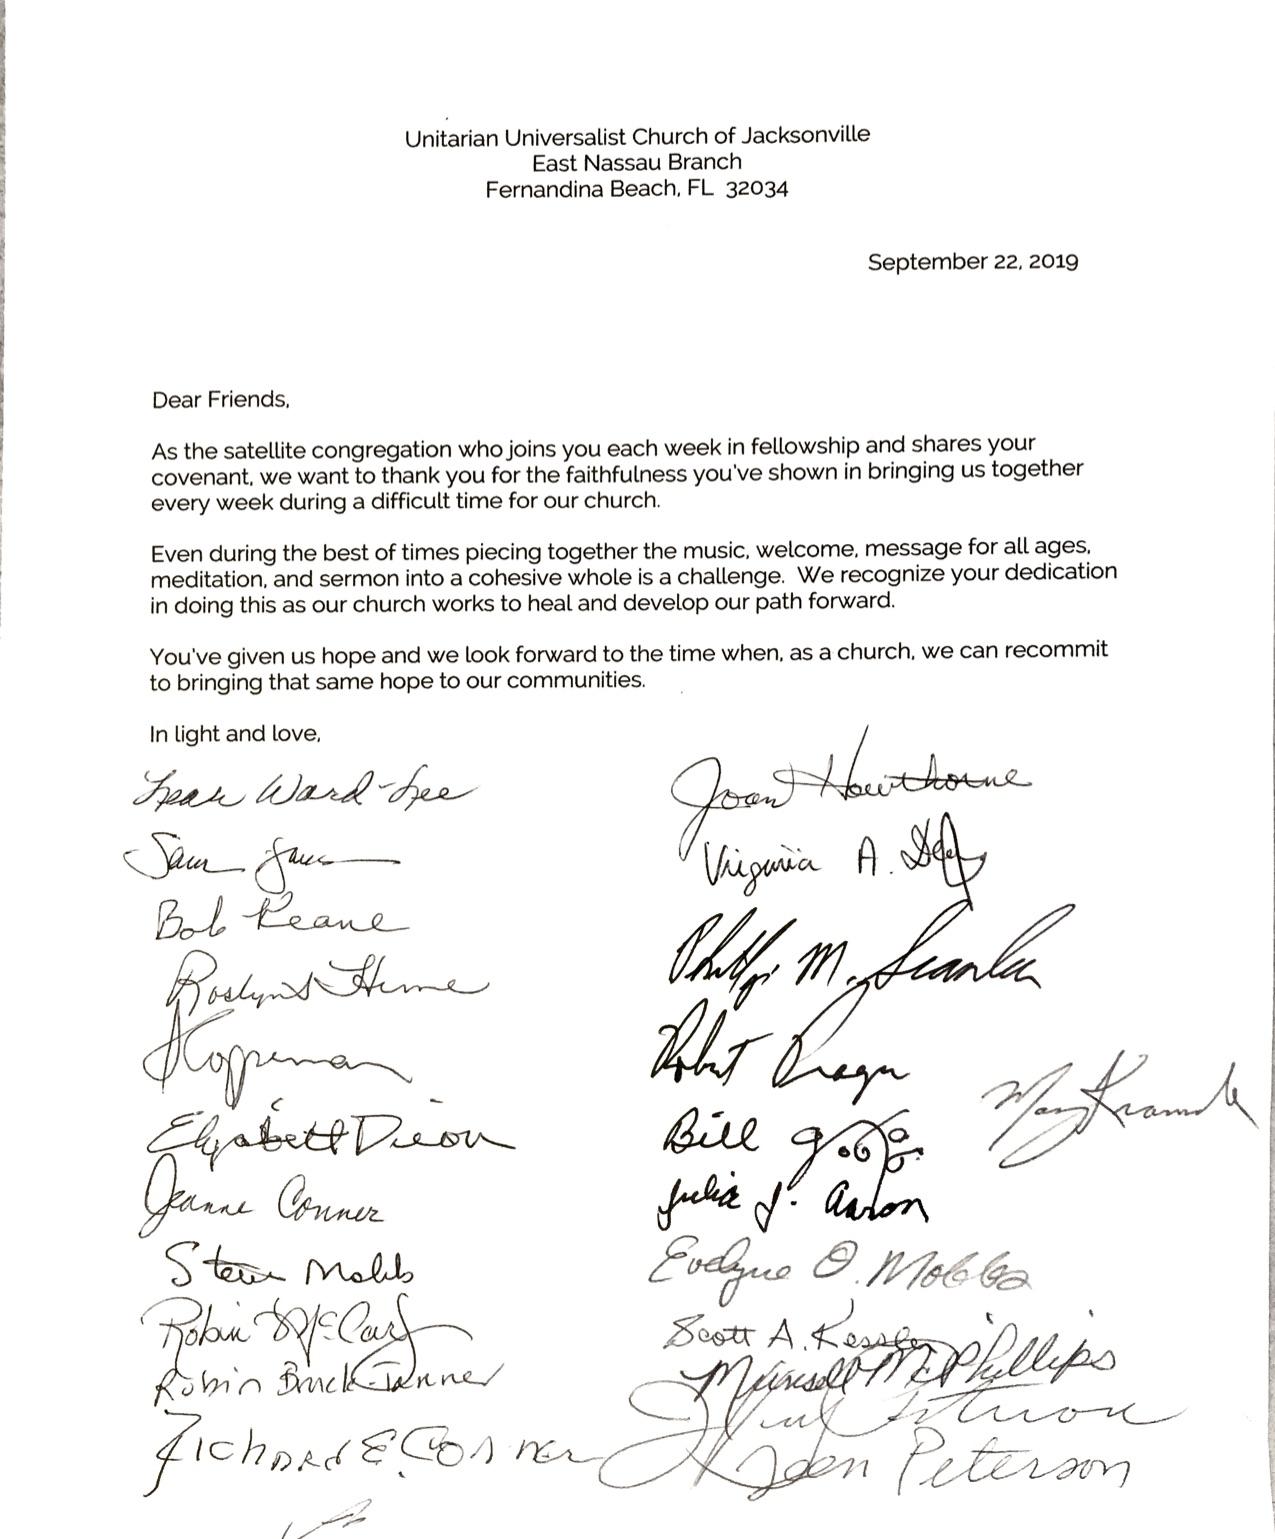 East Nassau Letter